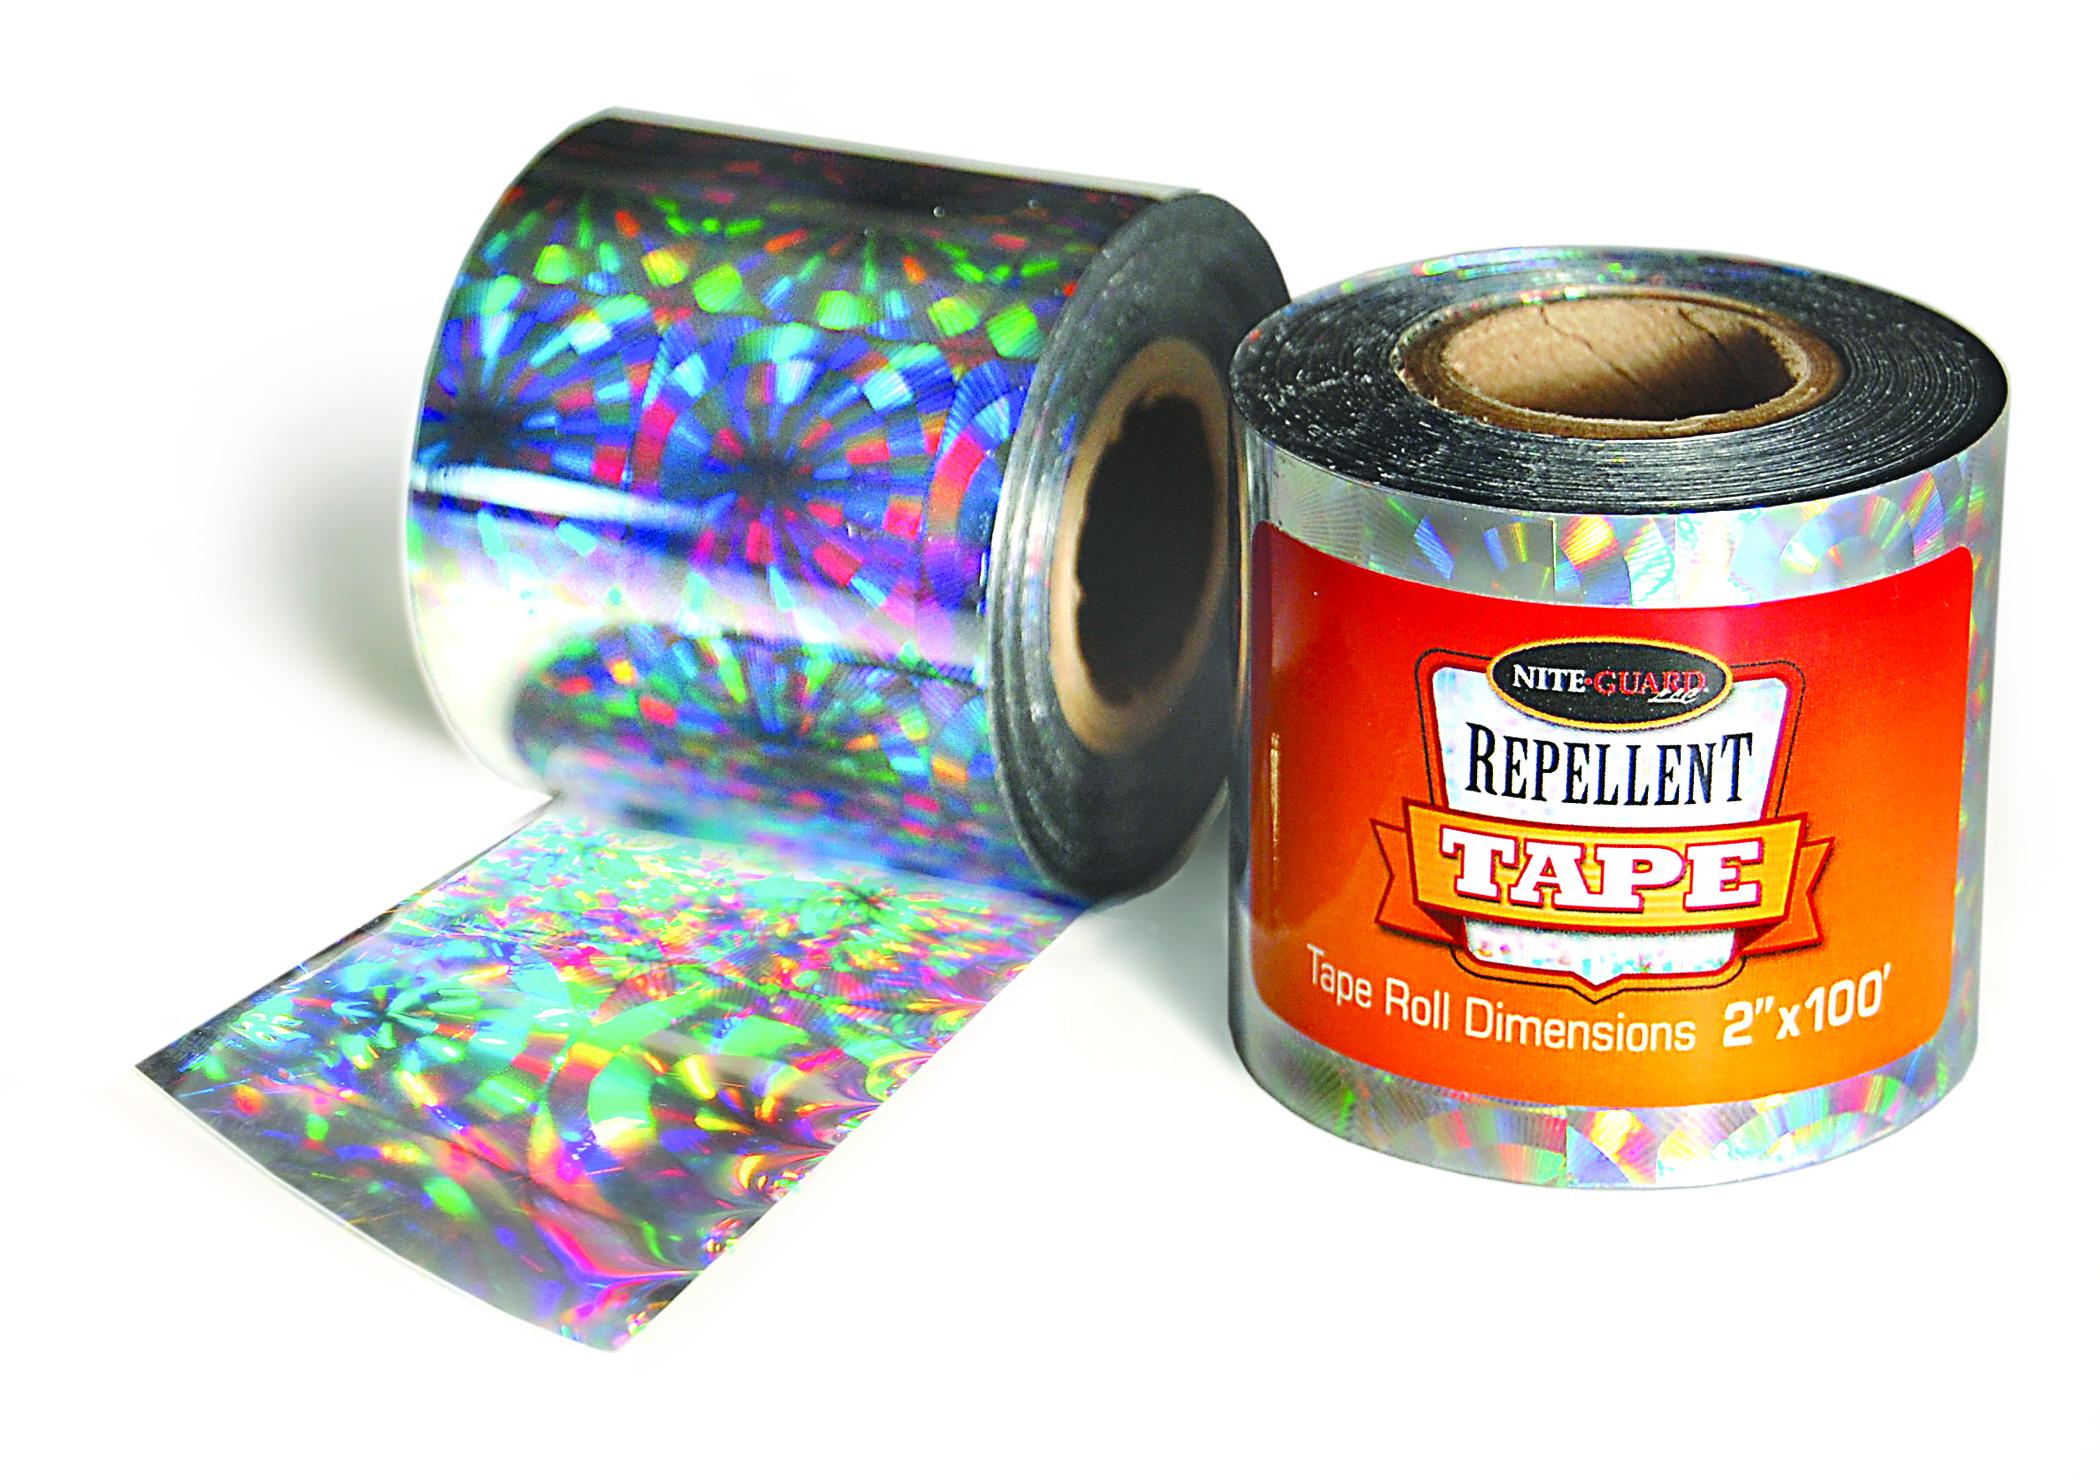 nite-guard-repellent-tape-product-photo